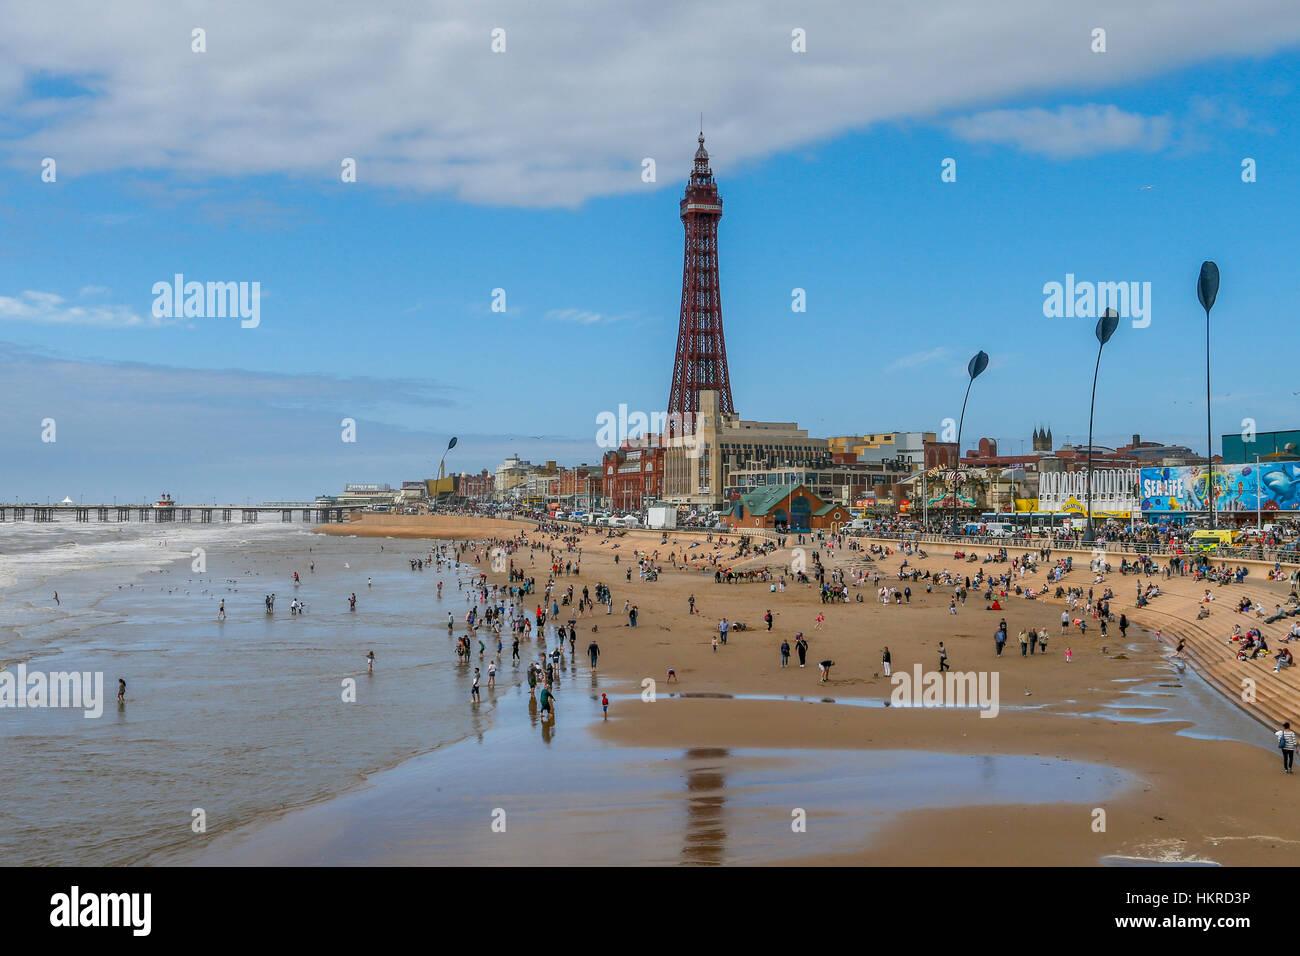 Front de mer de Blackpool Tower et Blackpool, Lancashire, Angleterre,. Photo Stock